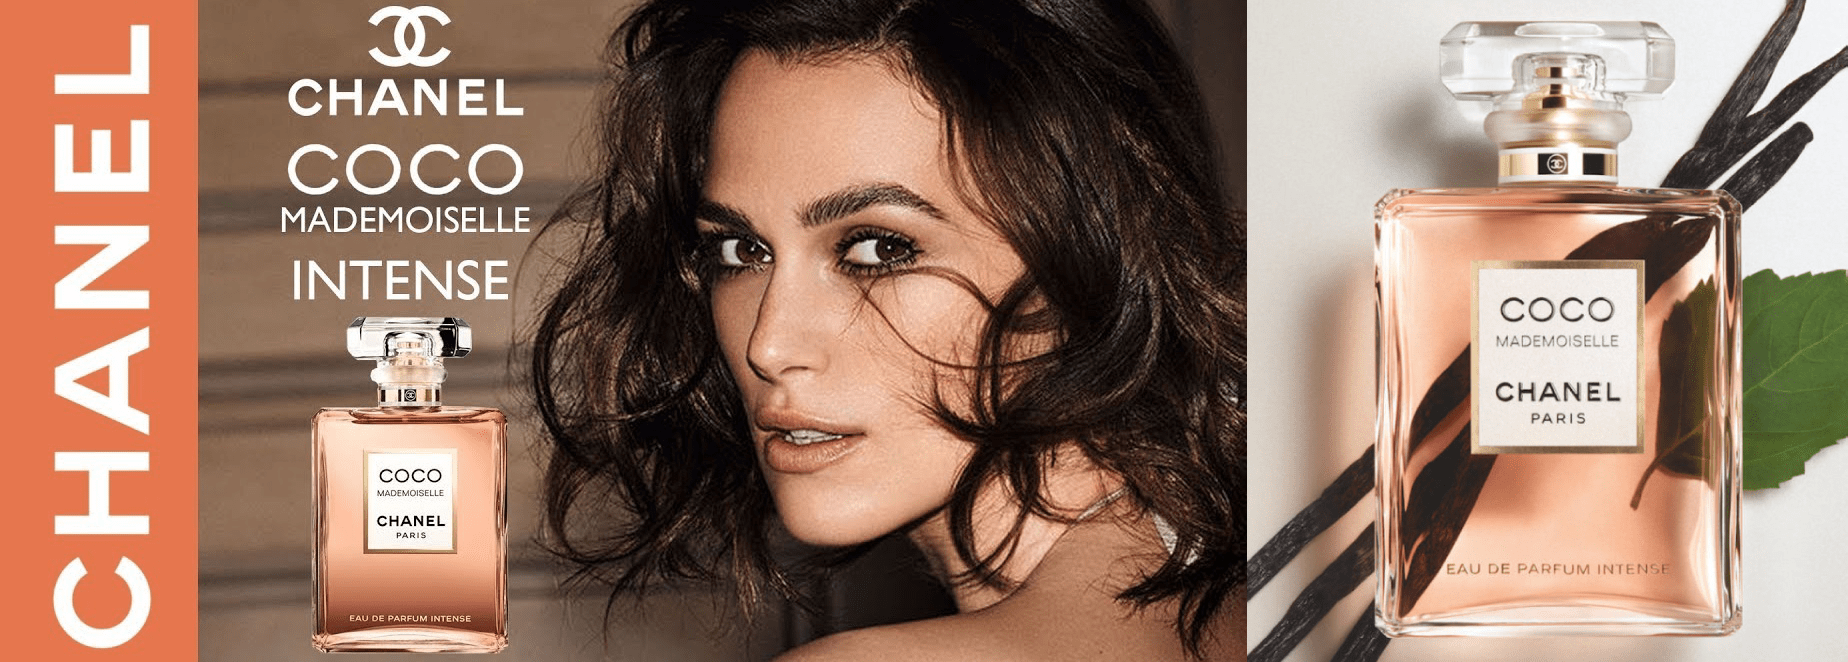 Chanel Coco Mademoiselle EDT For Women - 100 ml   Buy Online   Ubuy Kuwait